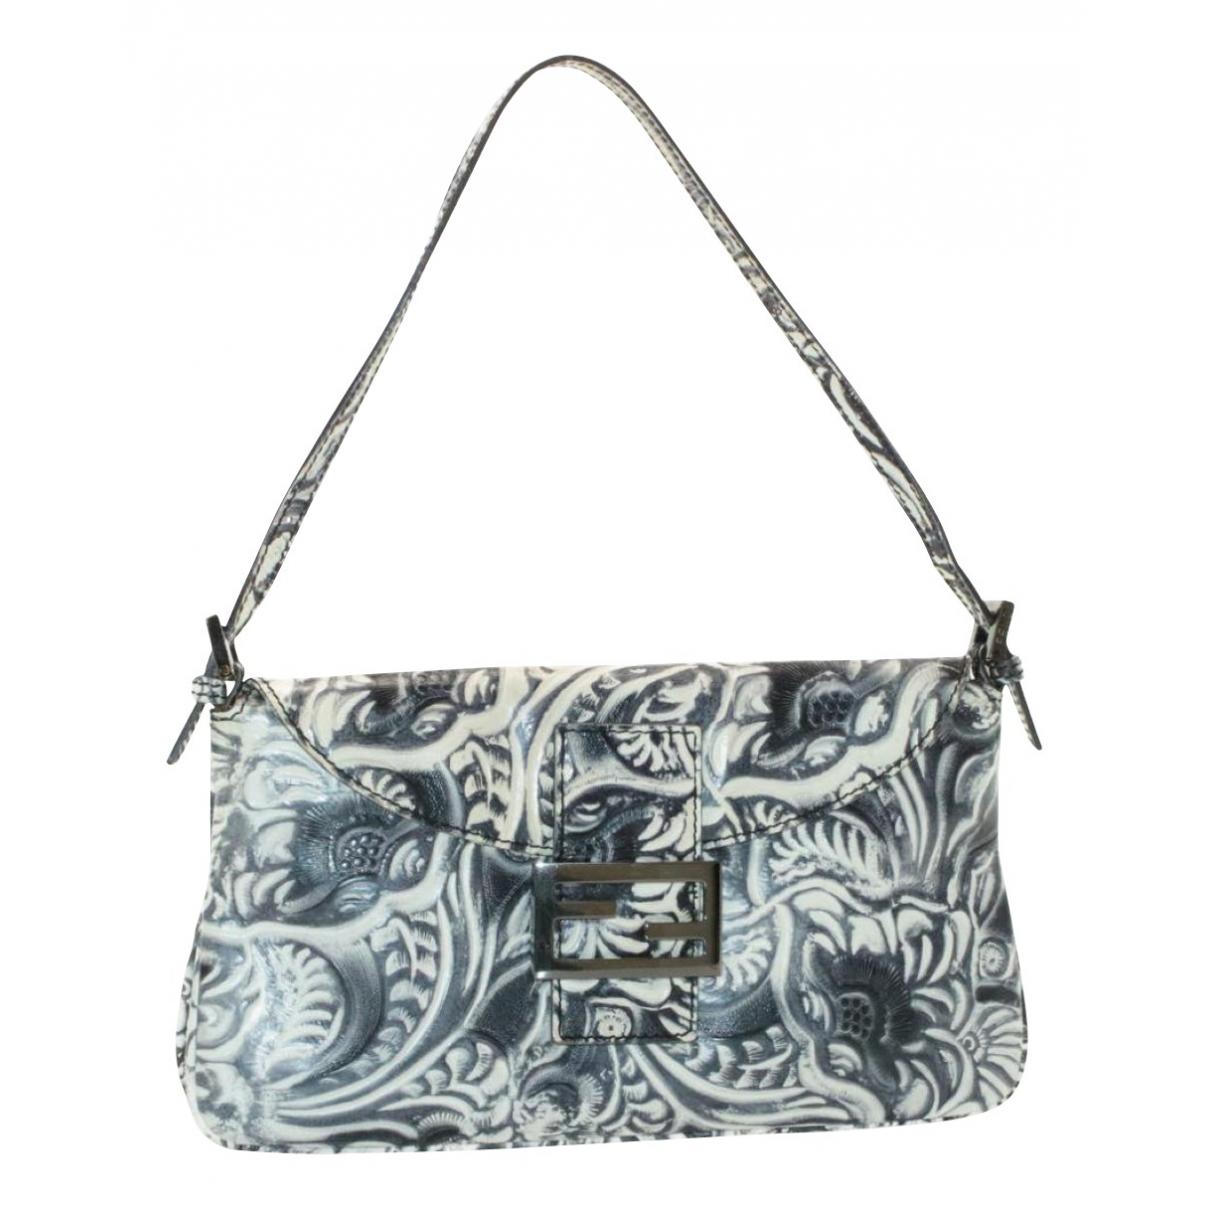 Fendi Baguette Handtasche in  Blau Leder